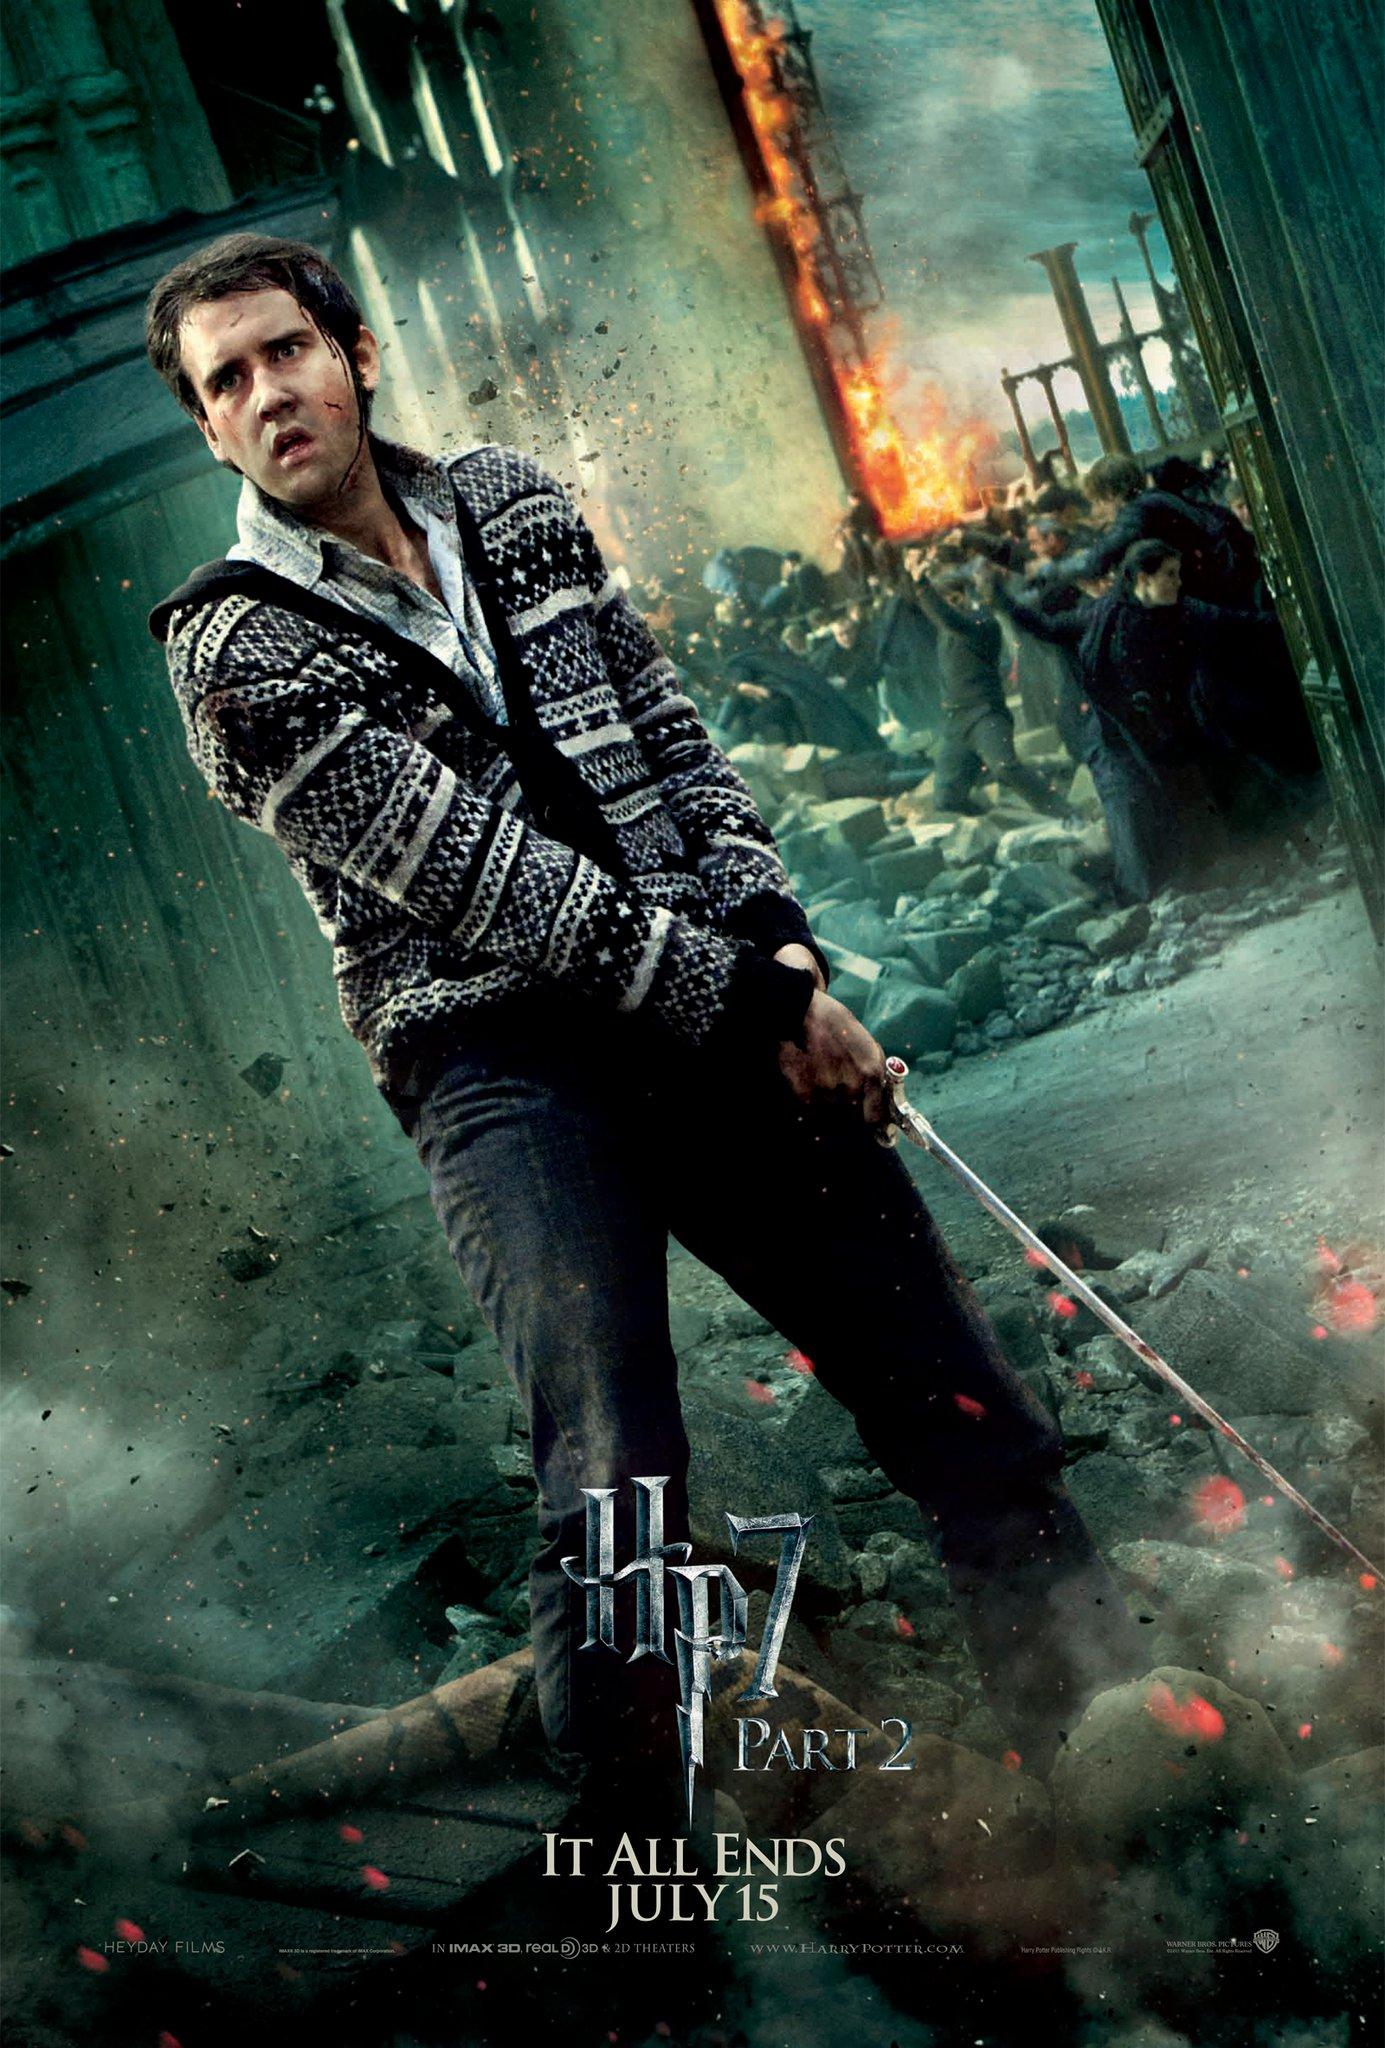 Wallpaper HP7 Part 2 poster - Neville Harry Potter